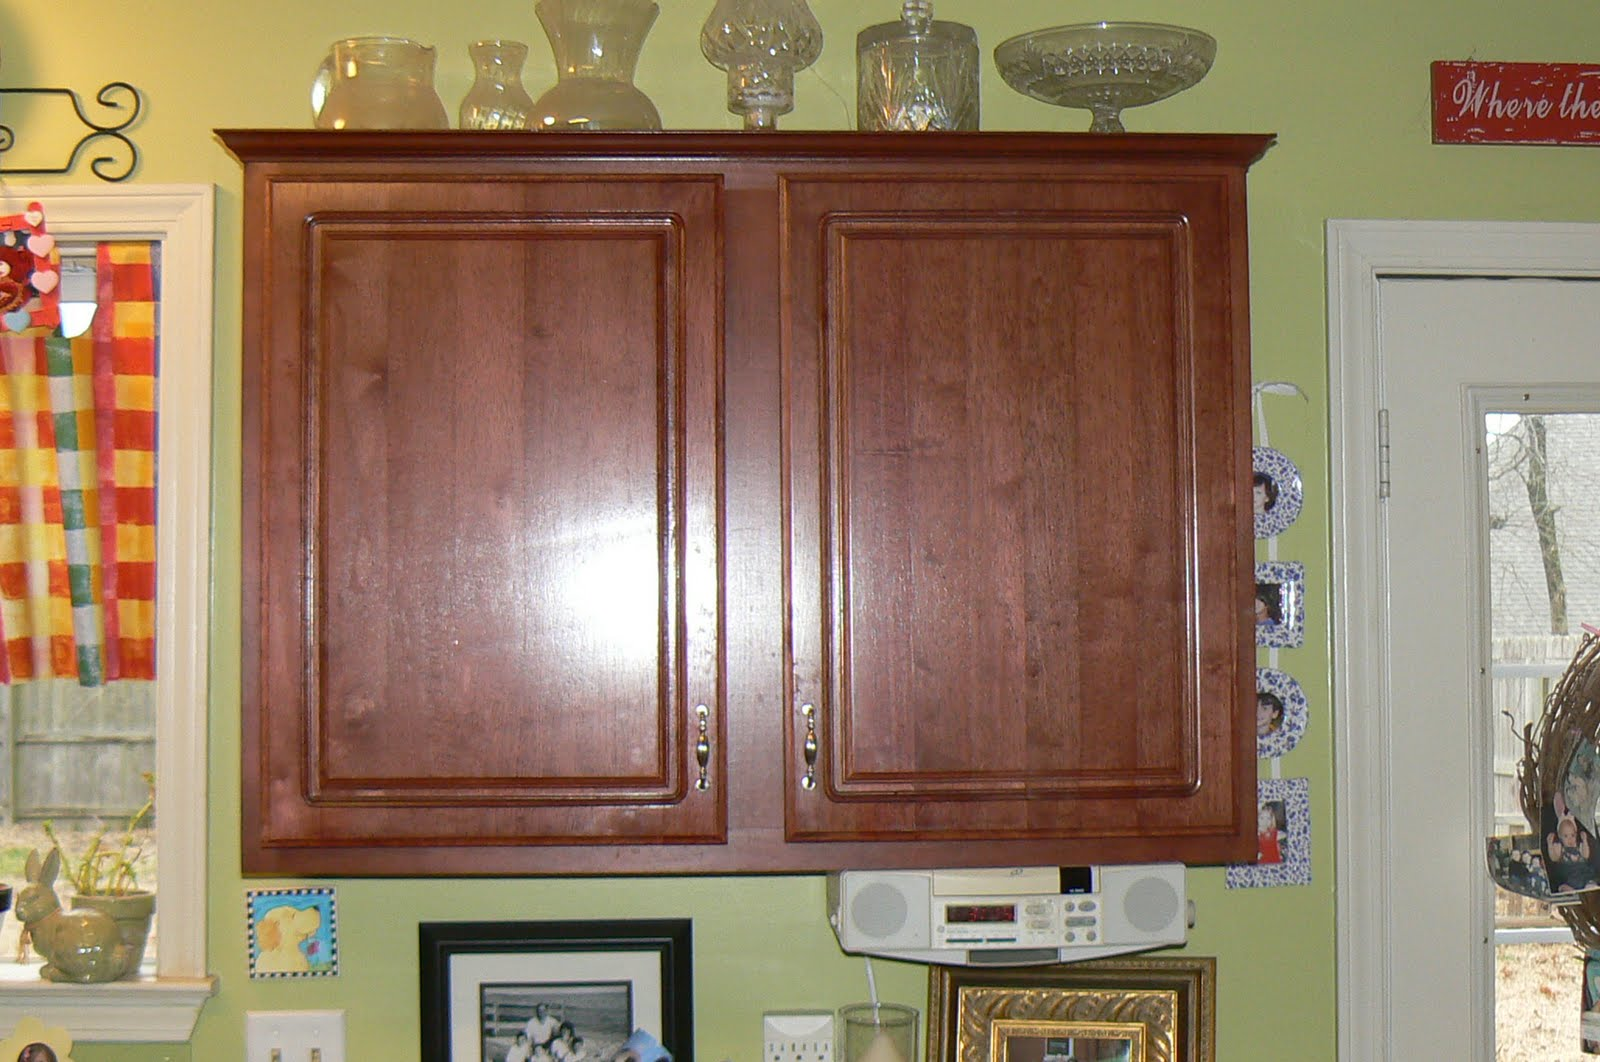 Glazed Kitchen Cabinets Back Splash My 4littlepilgrims Painted And